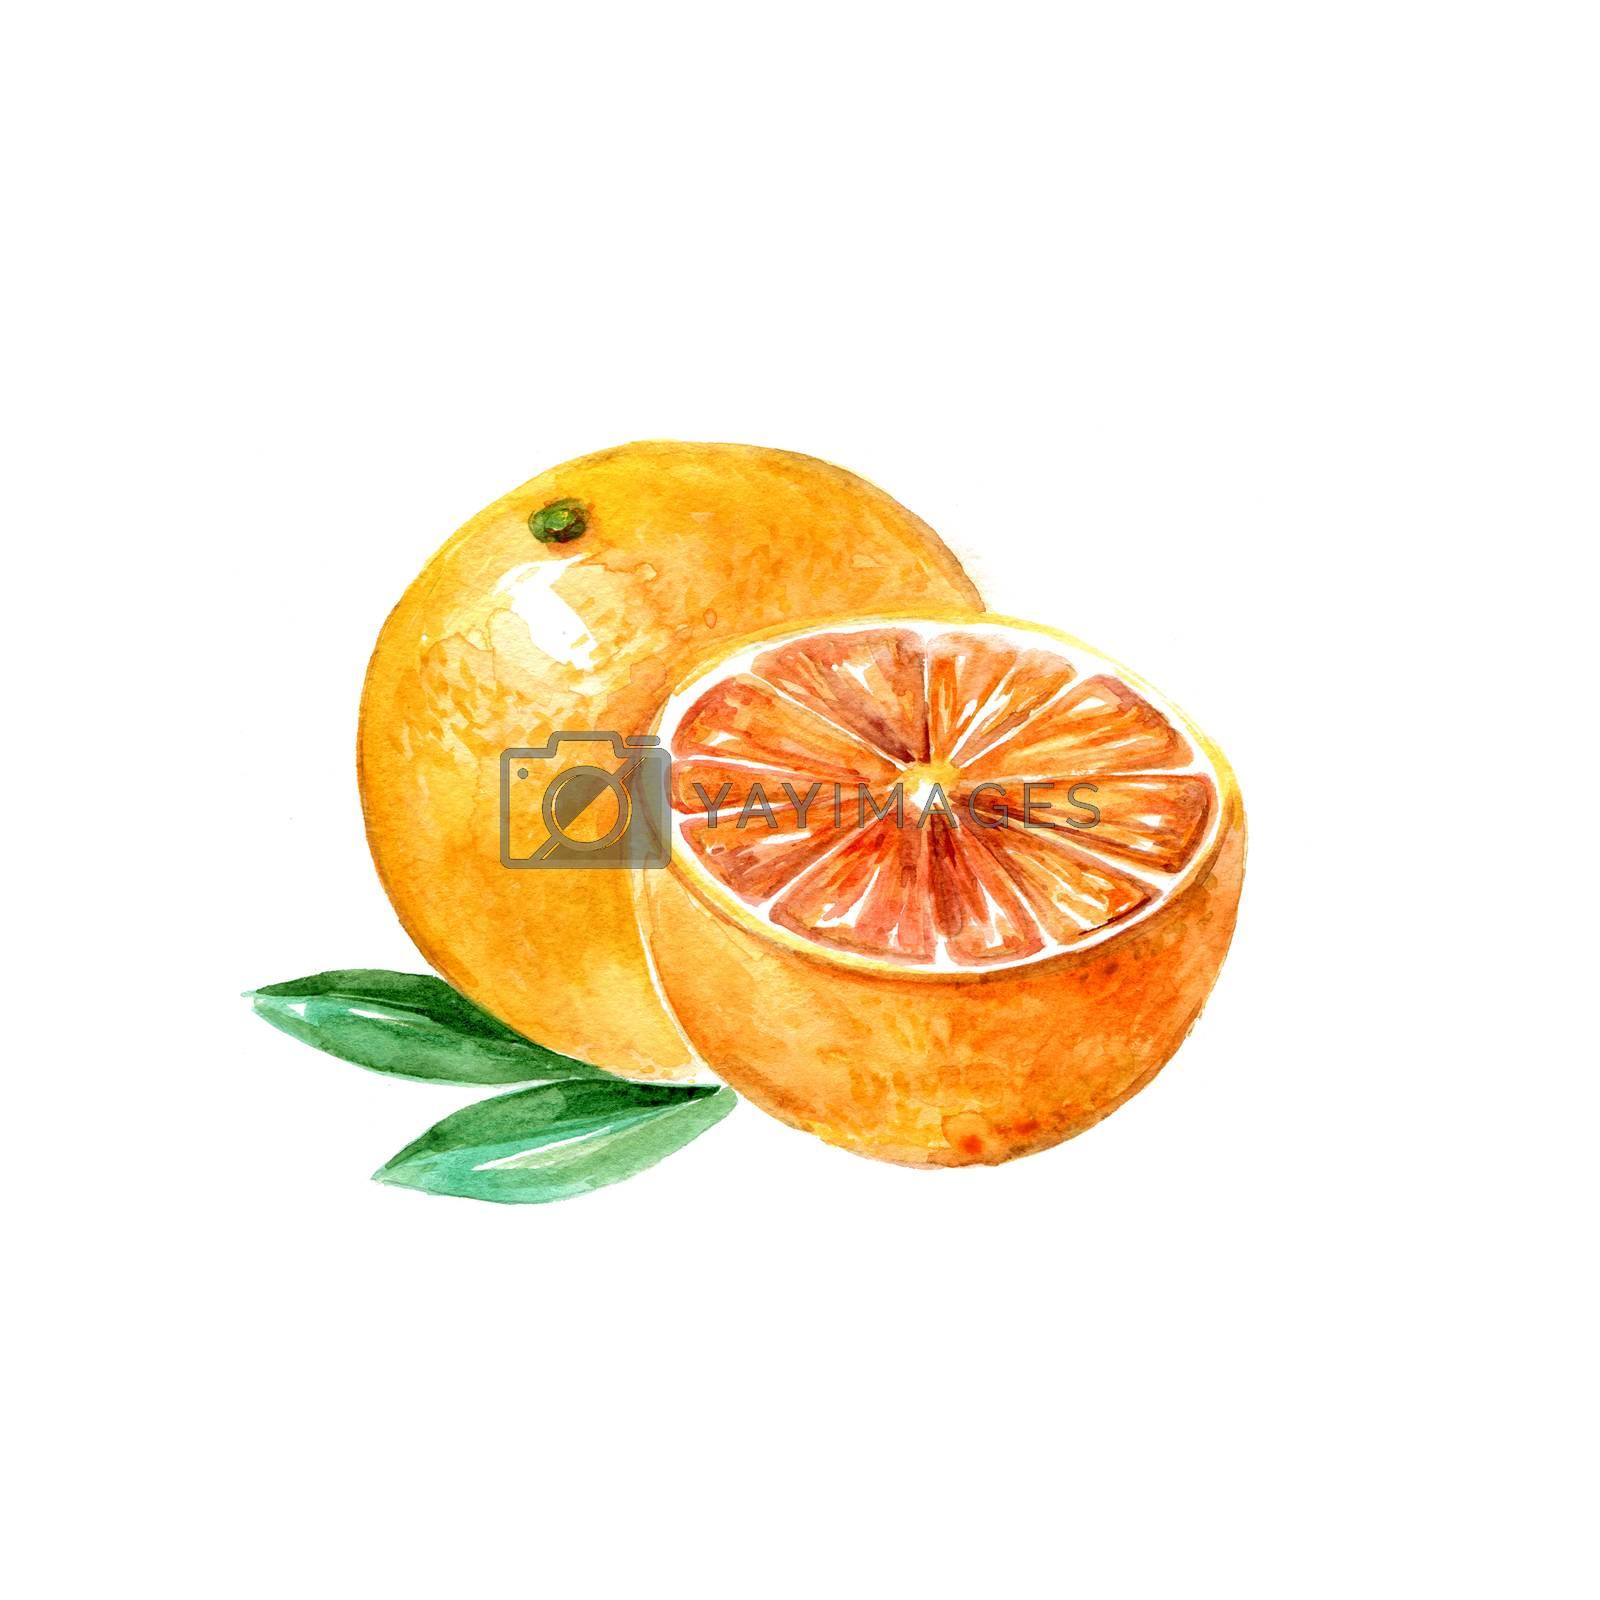 Watercolor Grapefruit. Hand Drawn Illustration Organic Food Vegetarian Ingredient